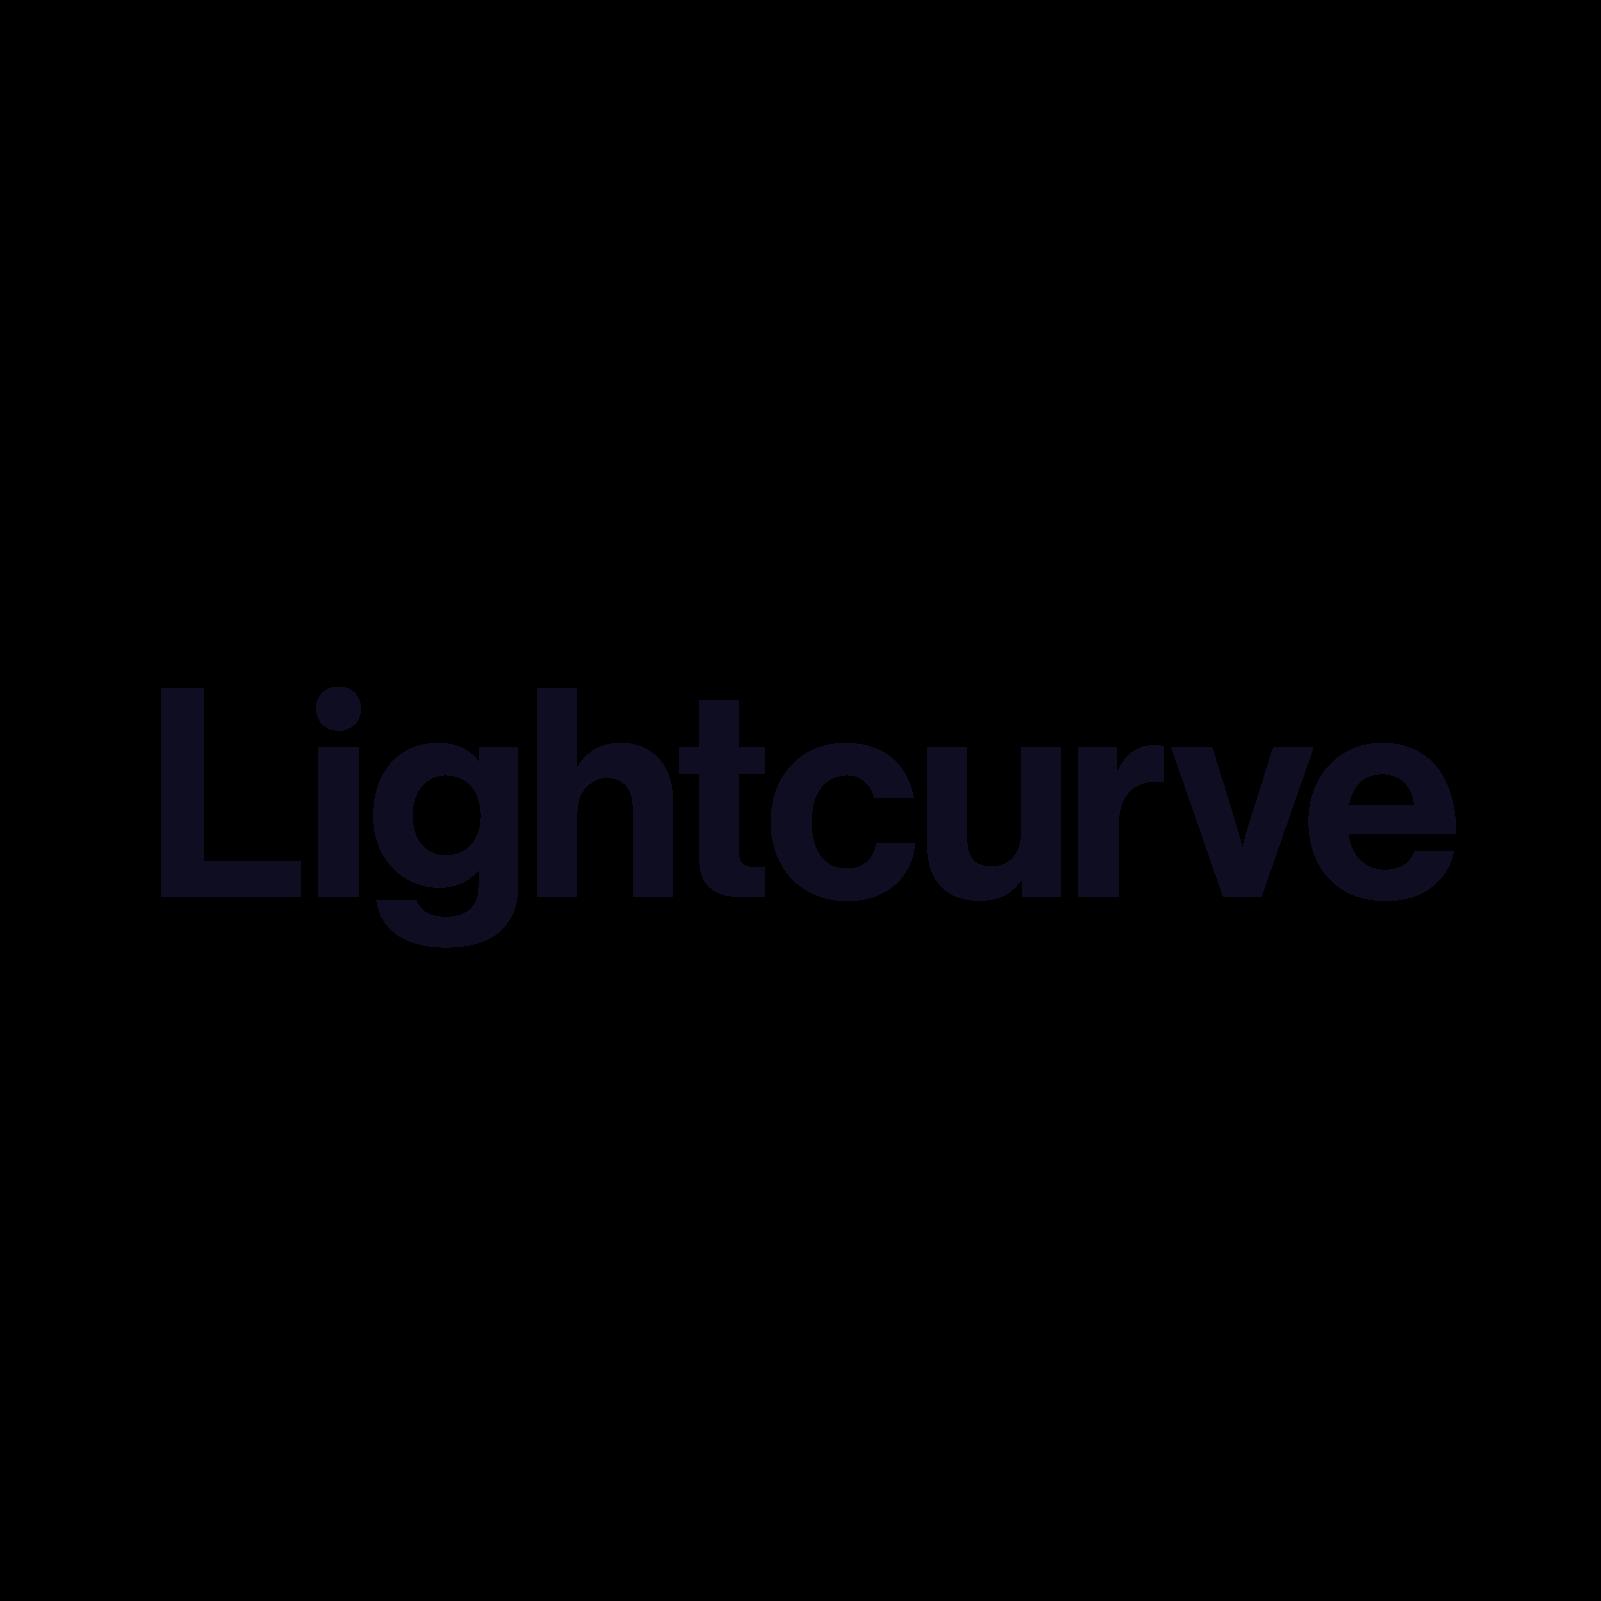 Lightcurve jobs